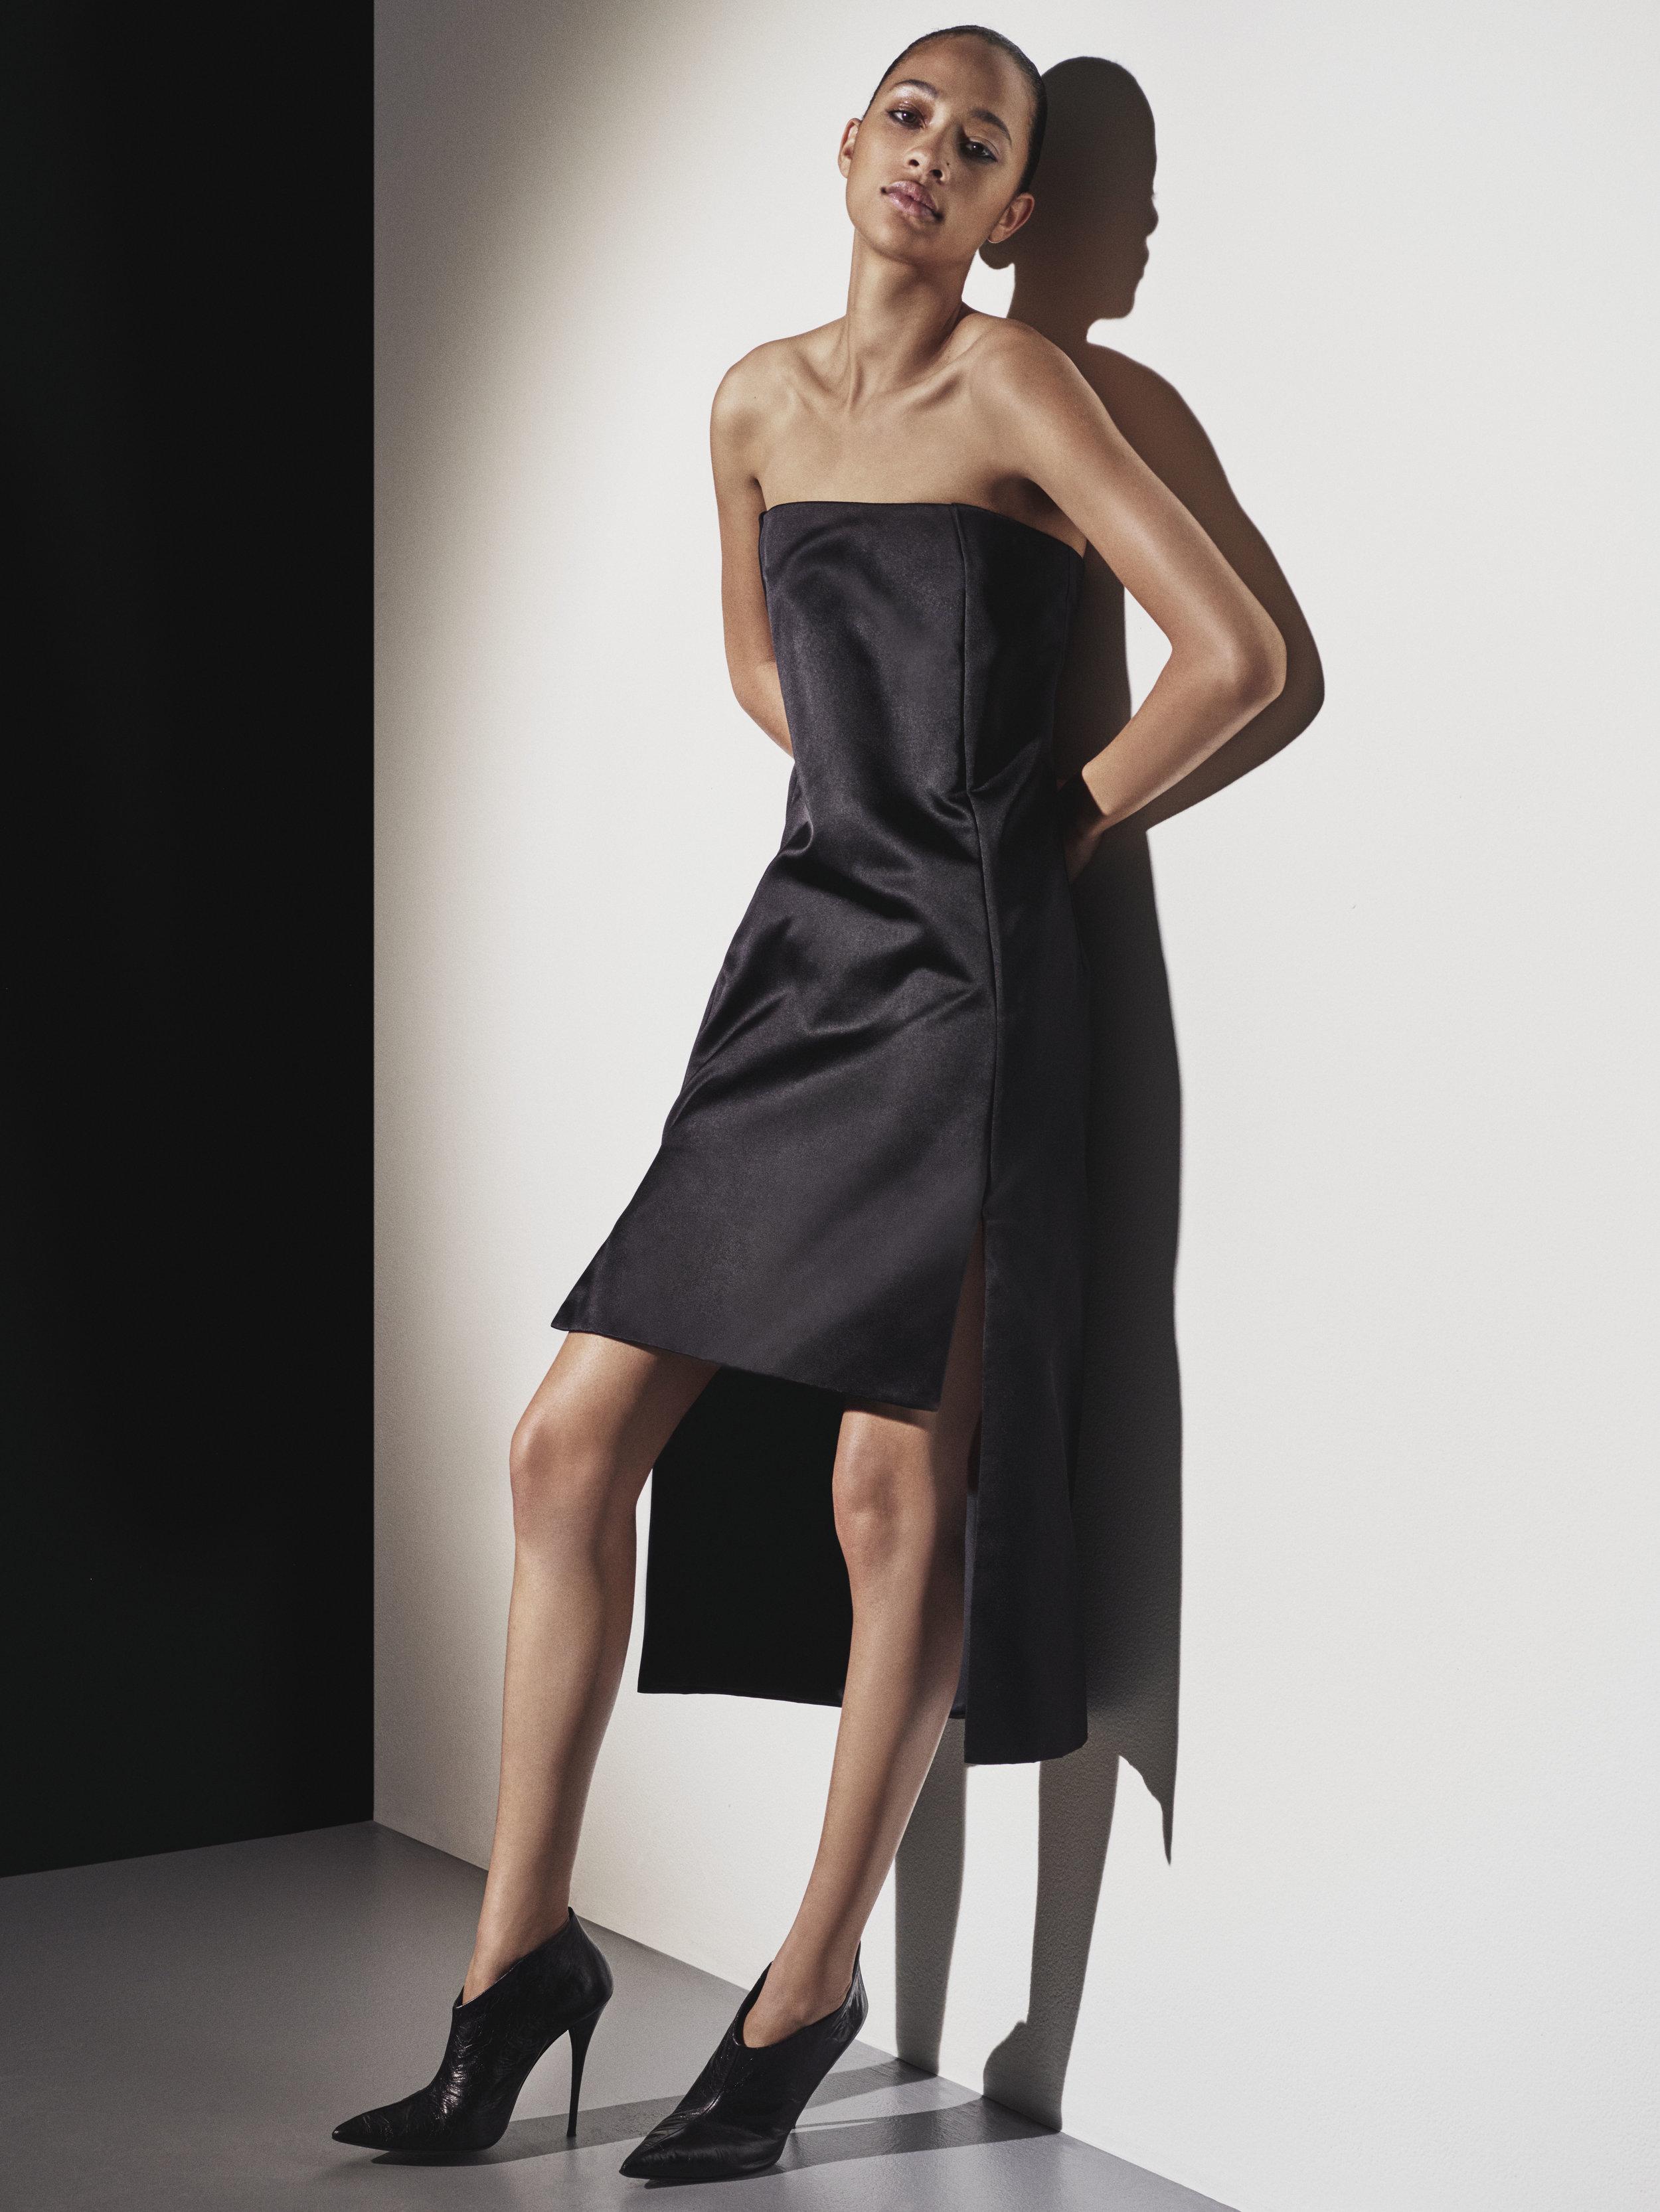 Look 2 Black duchess satin strapless dress.